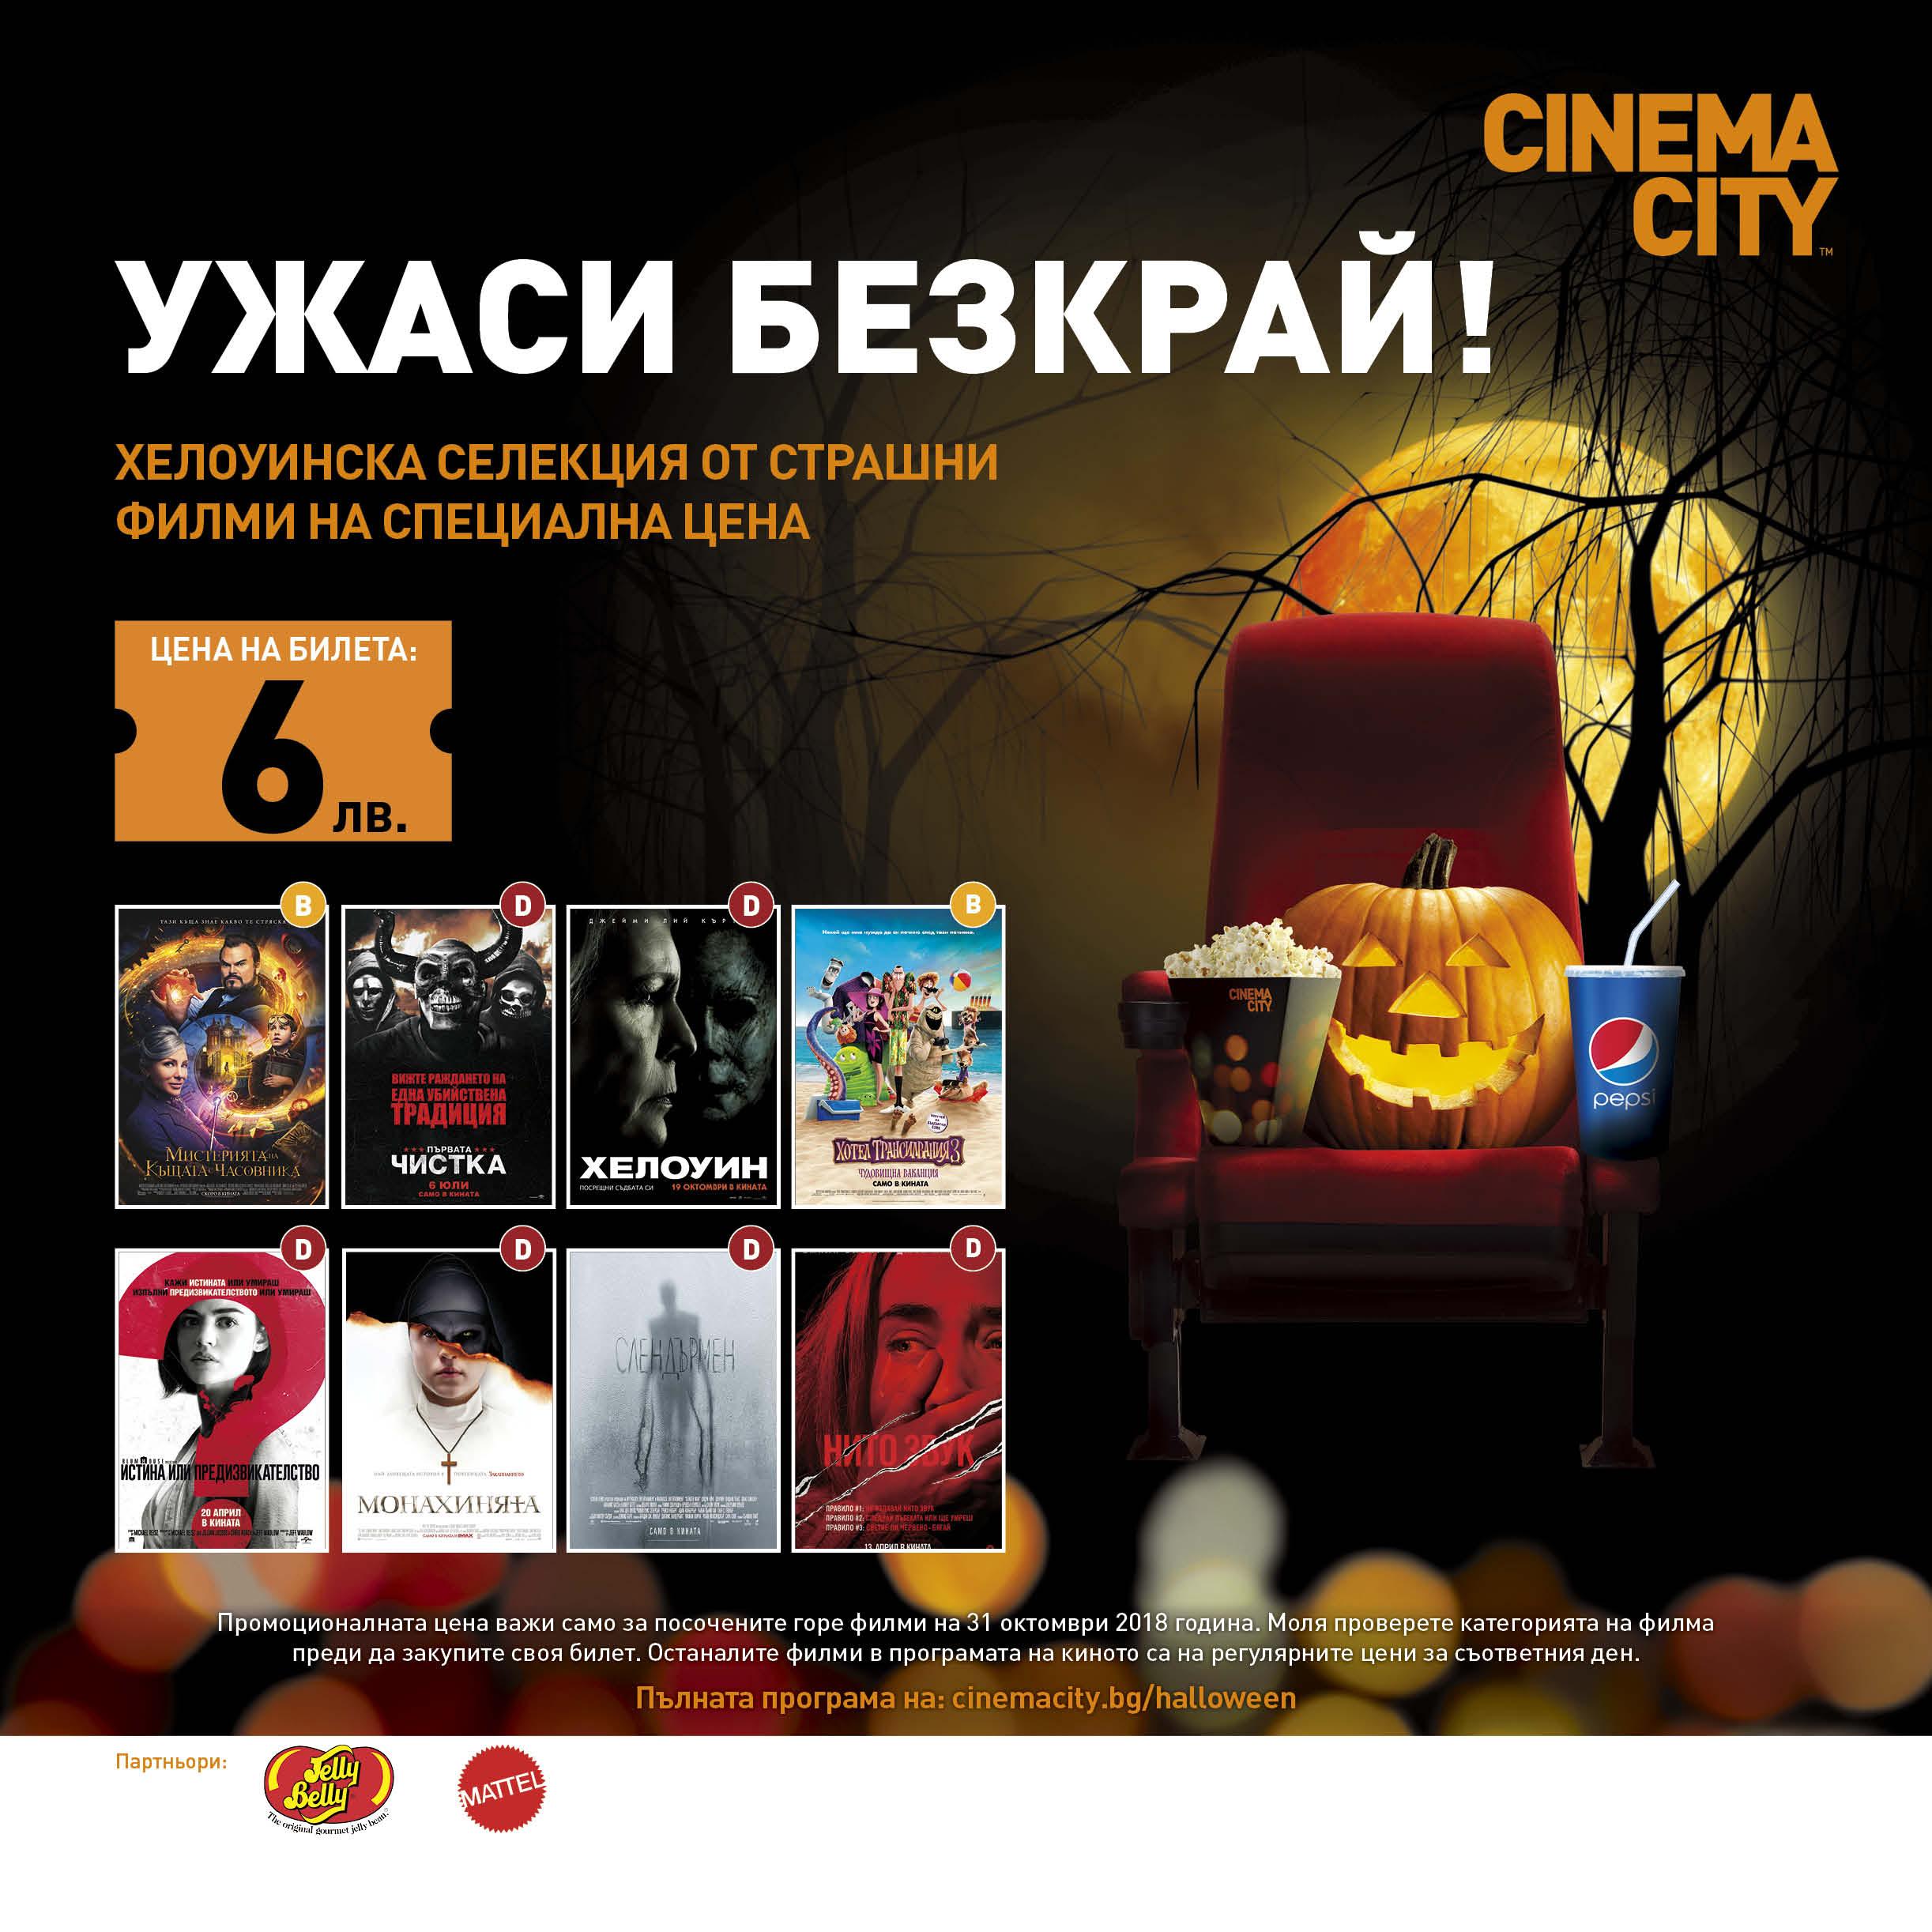 Ужаси безкрай в Cinema City!